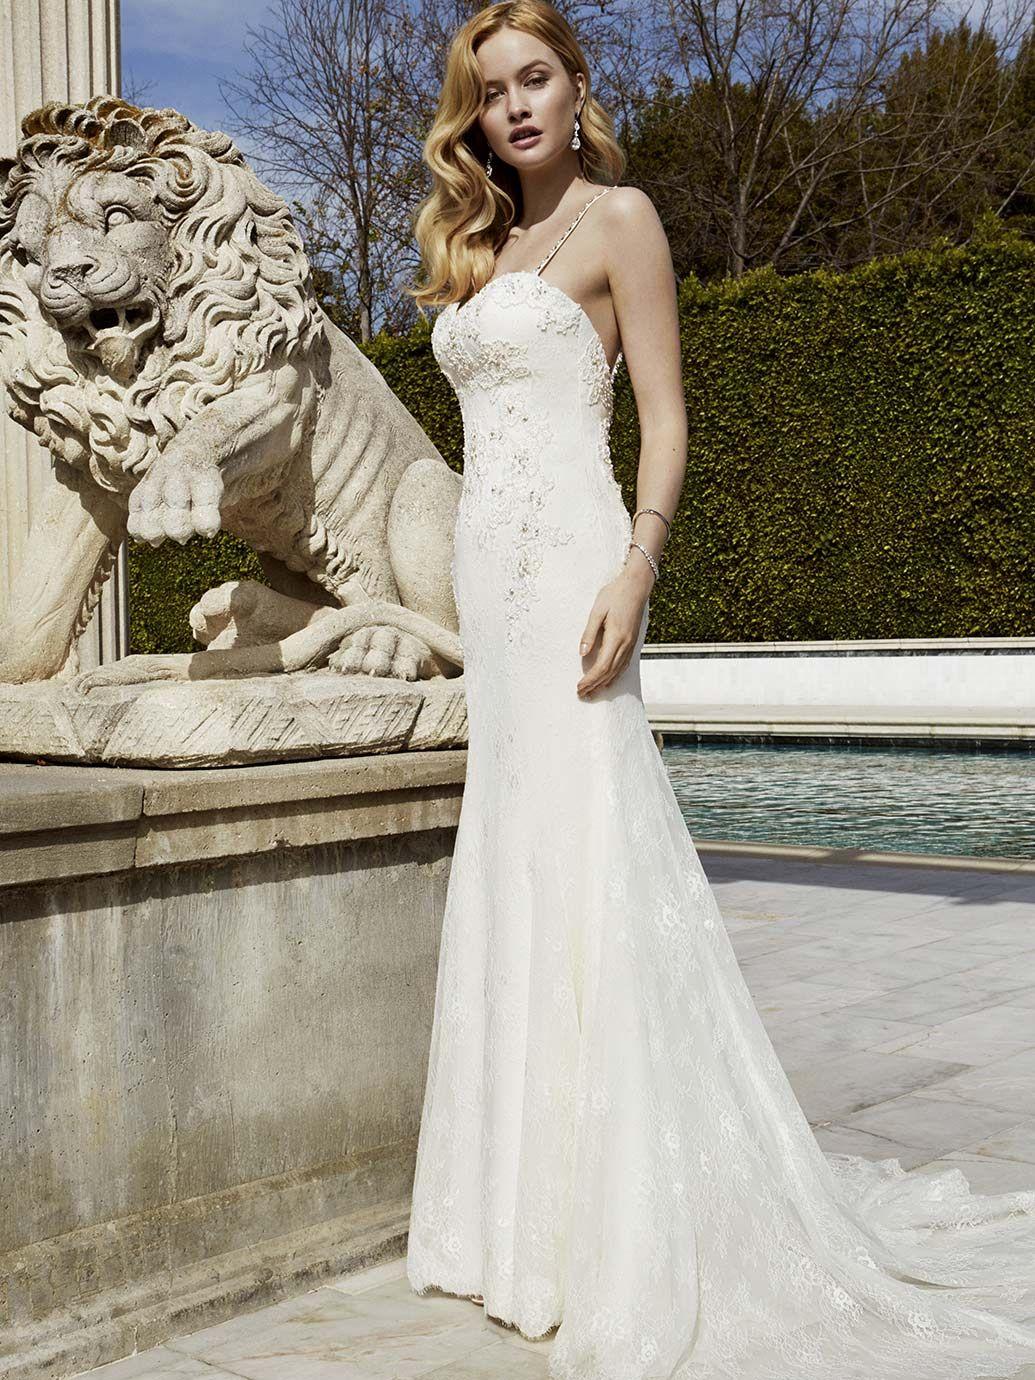 Available At Uptown Bridal Chandler Az 85225 Www Uptownbrides